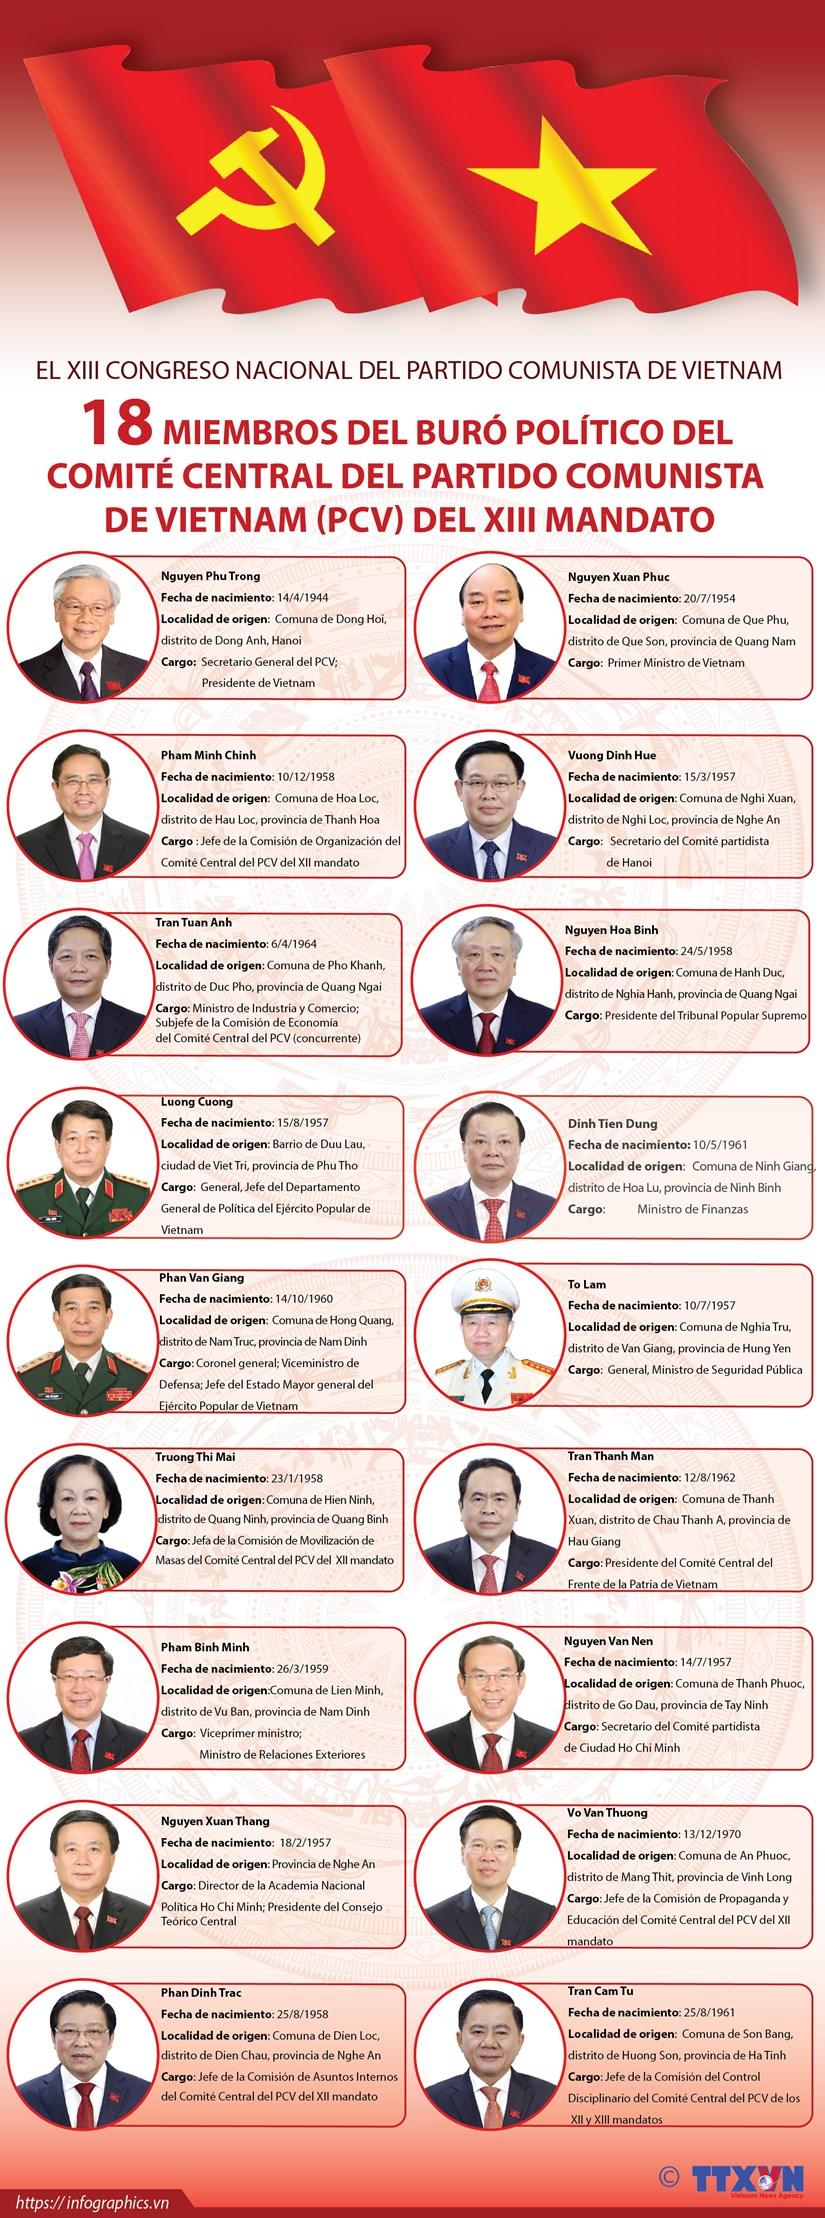 18 miembros del Buro Politico del Comite Central del Partido Comunista de Vietnam hinh anh 1